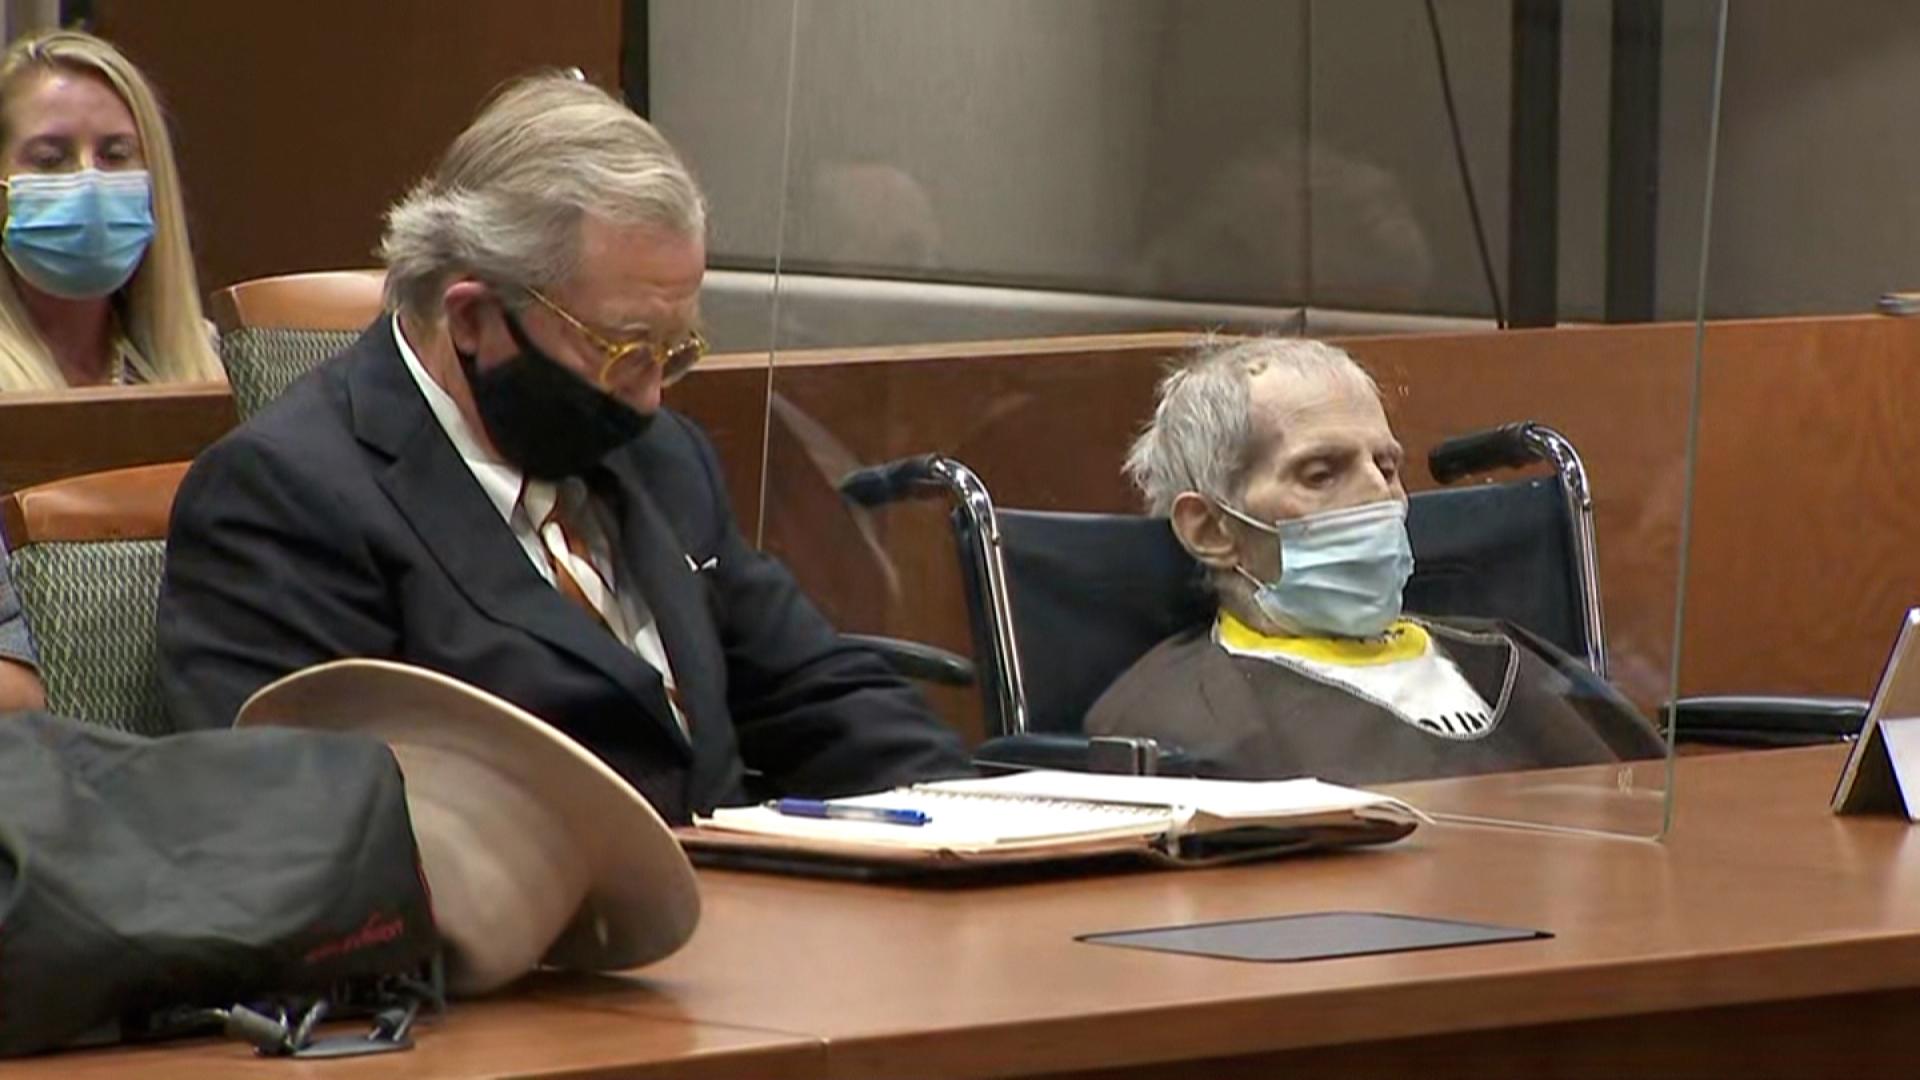 Robert Durst attends his sentencing on Thursday.